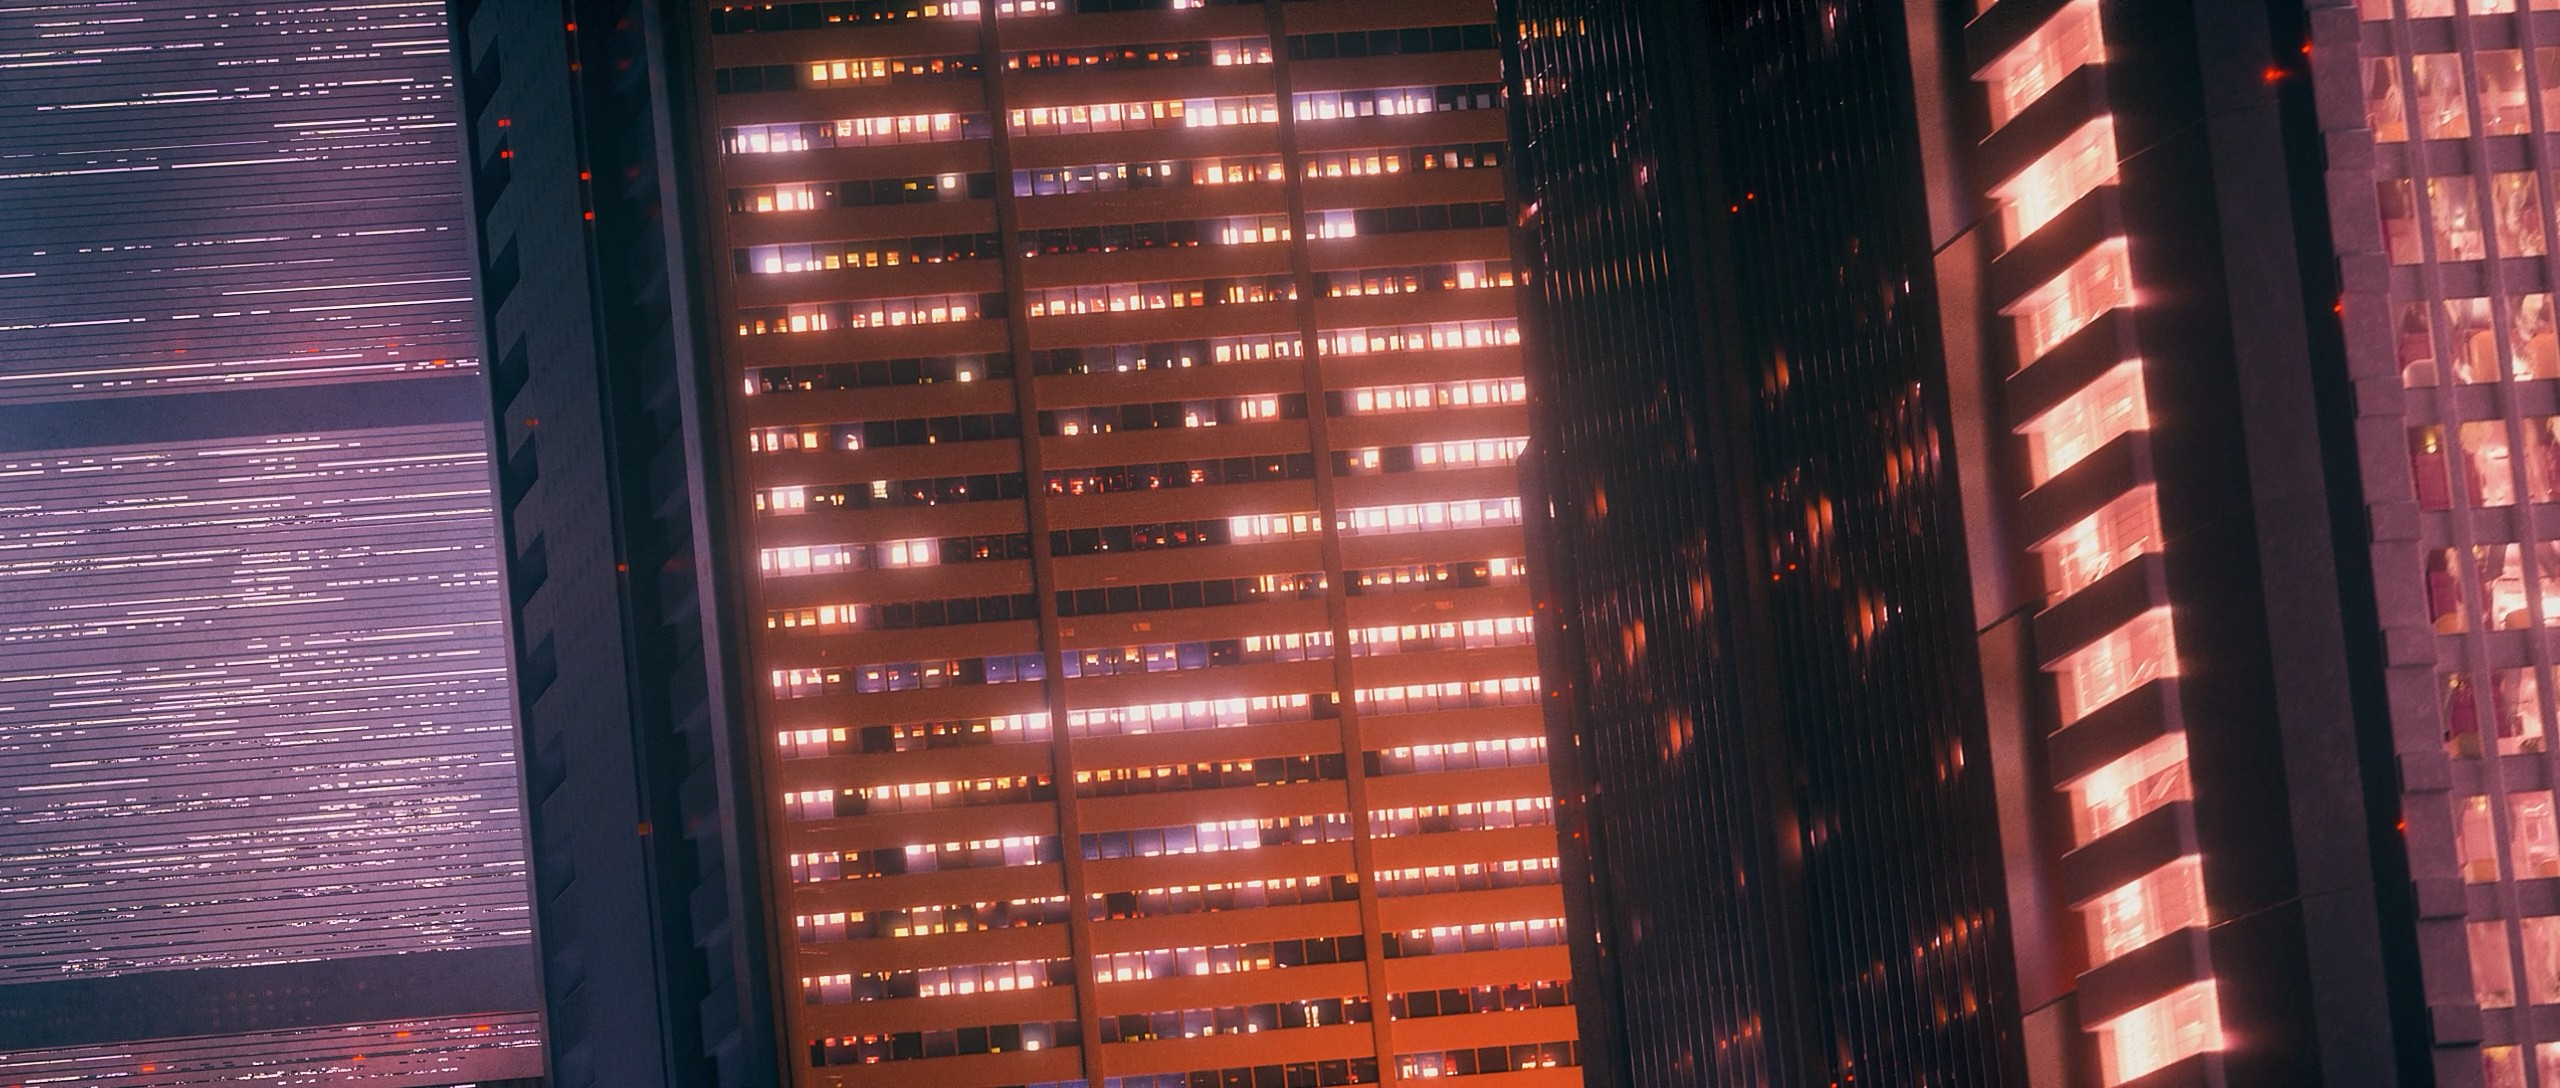 General 2560x1088 Akira awaken akira anime cyberpunk building neo-tokyo city Japan